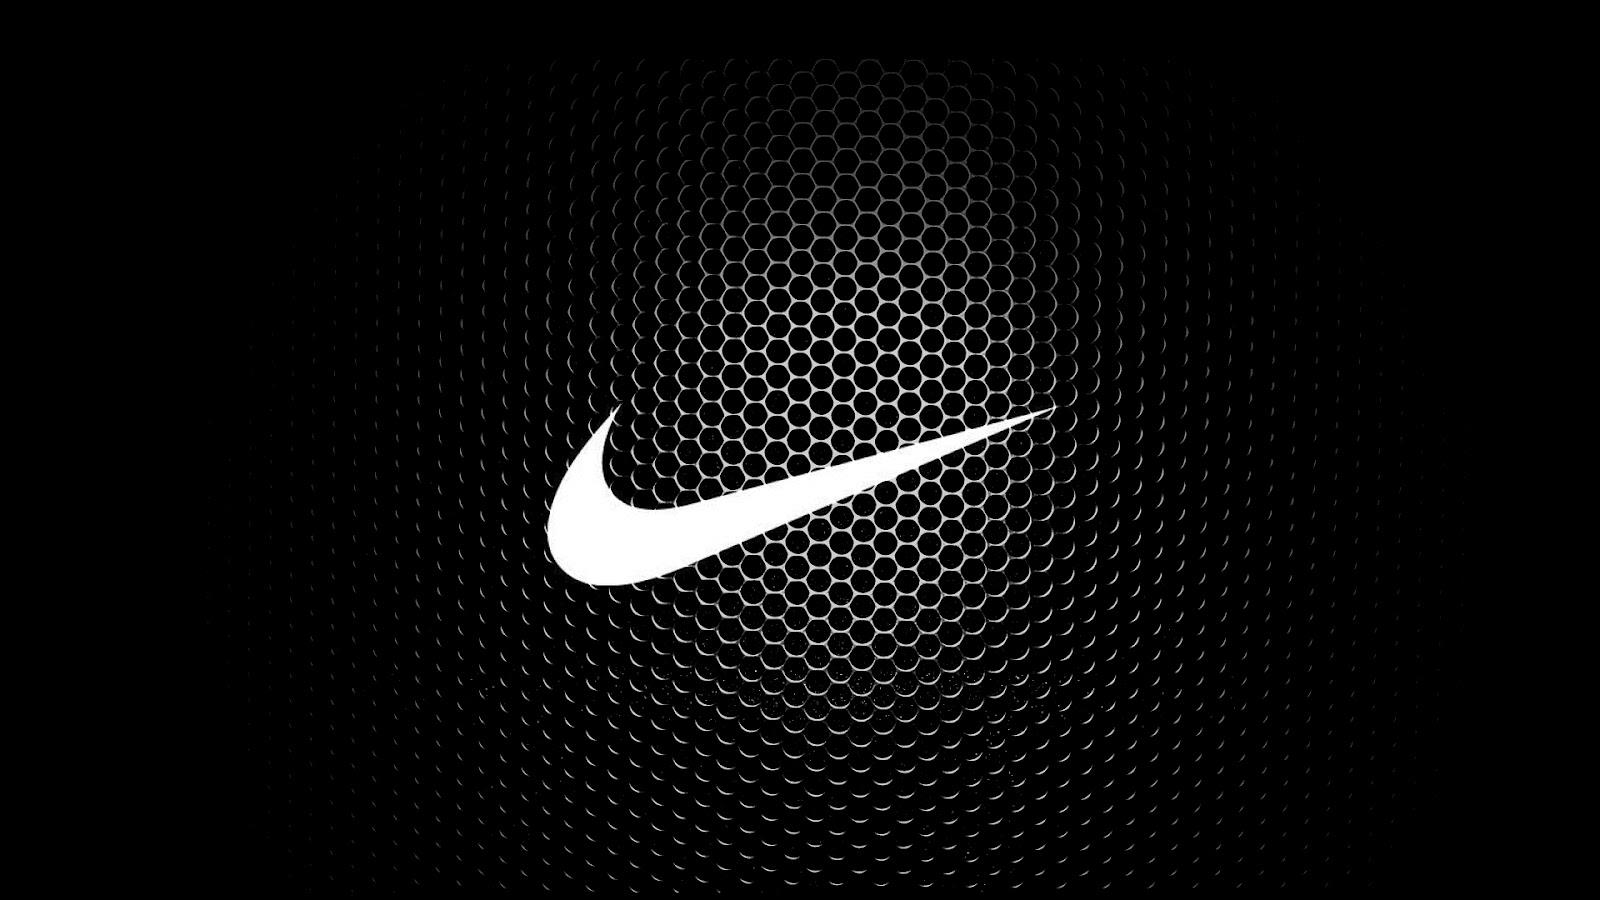 Nike Wallpaper Black 1600x900